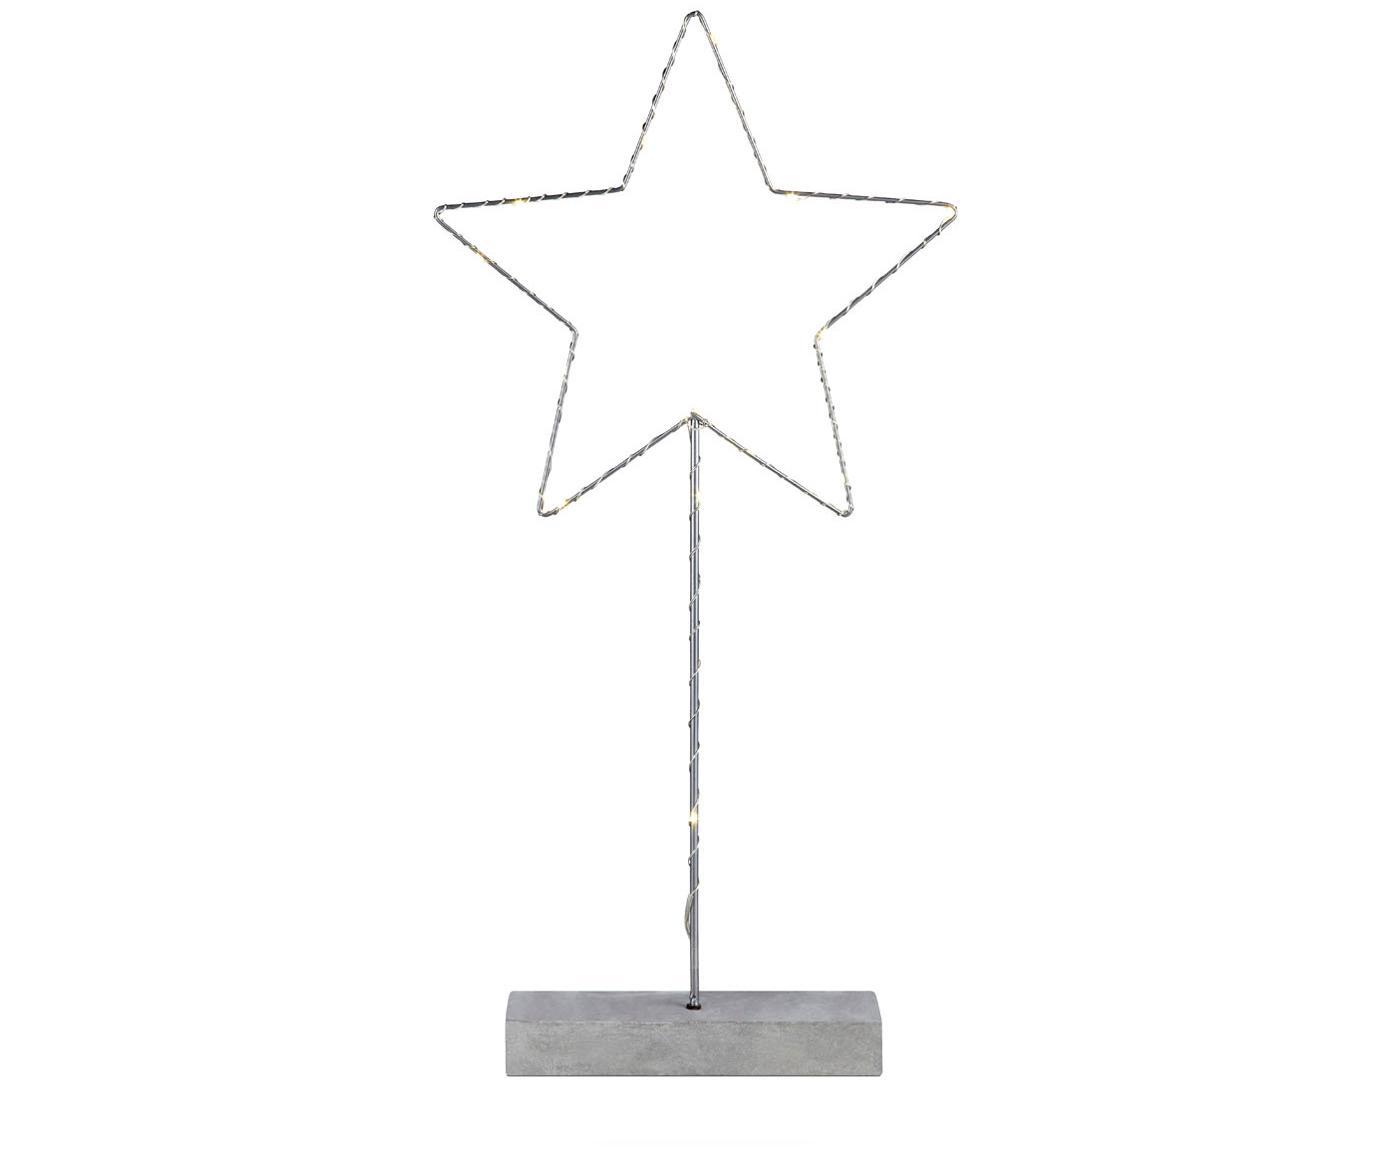 LED-Tischleuchte Malin, Metall, lackiert, Grau, 26 x 51 cm